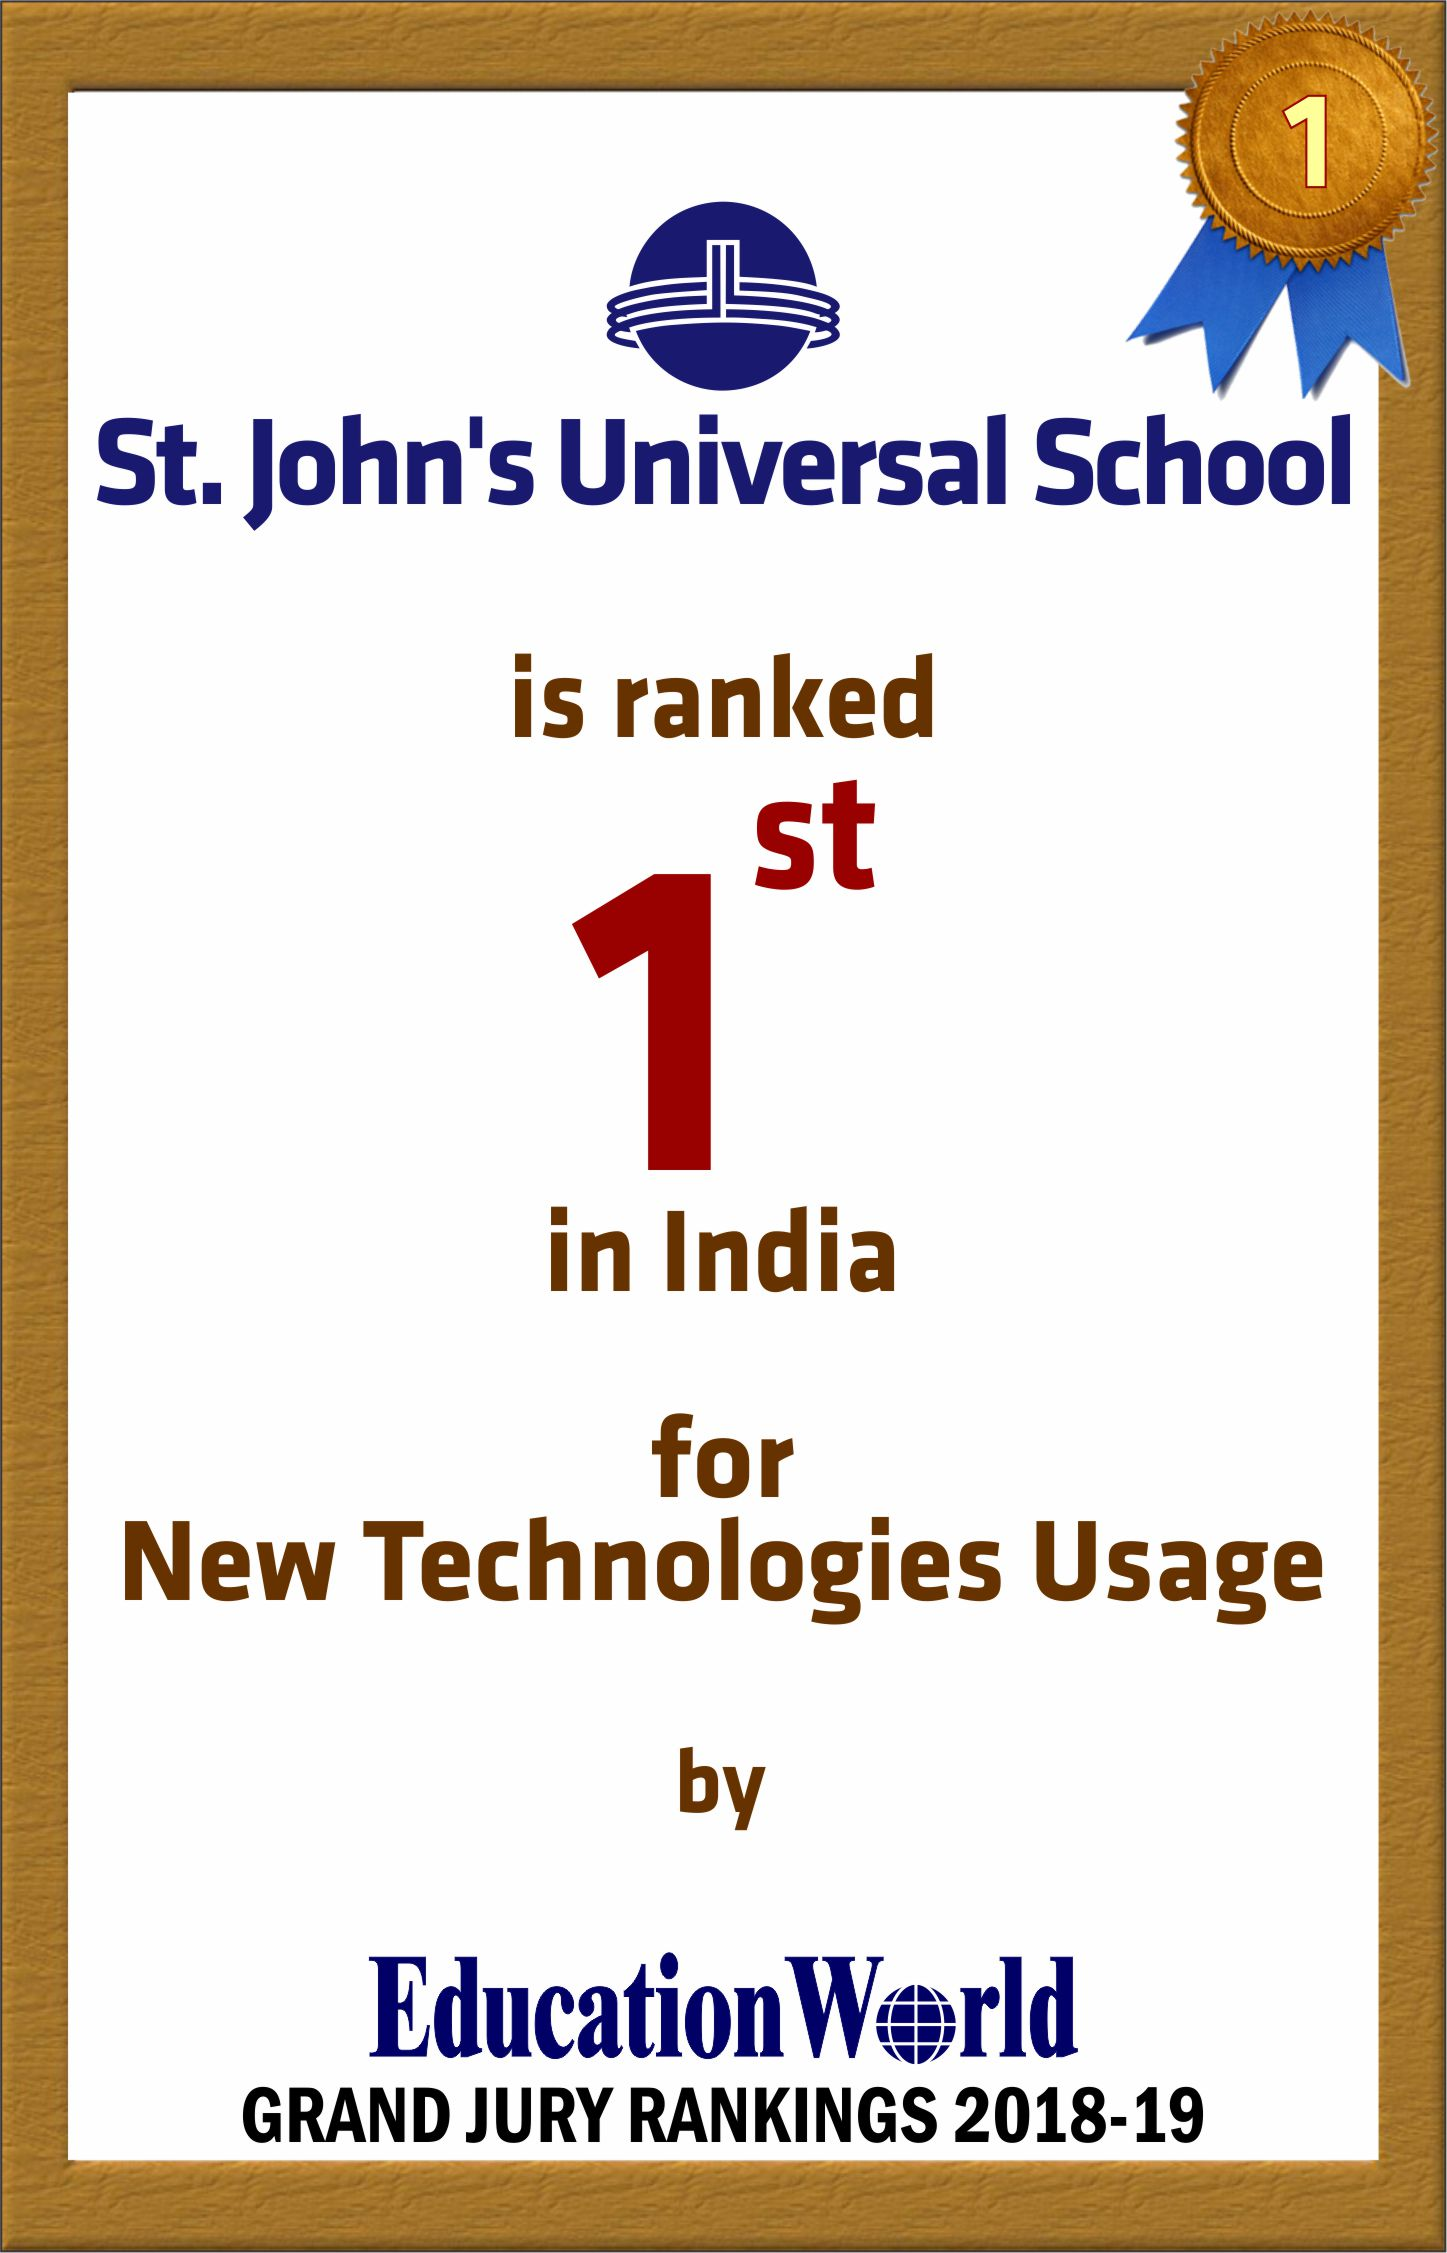 Best ICSE School in Goregaon, Mumbai, Top ICSE Board Schools in